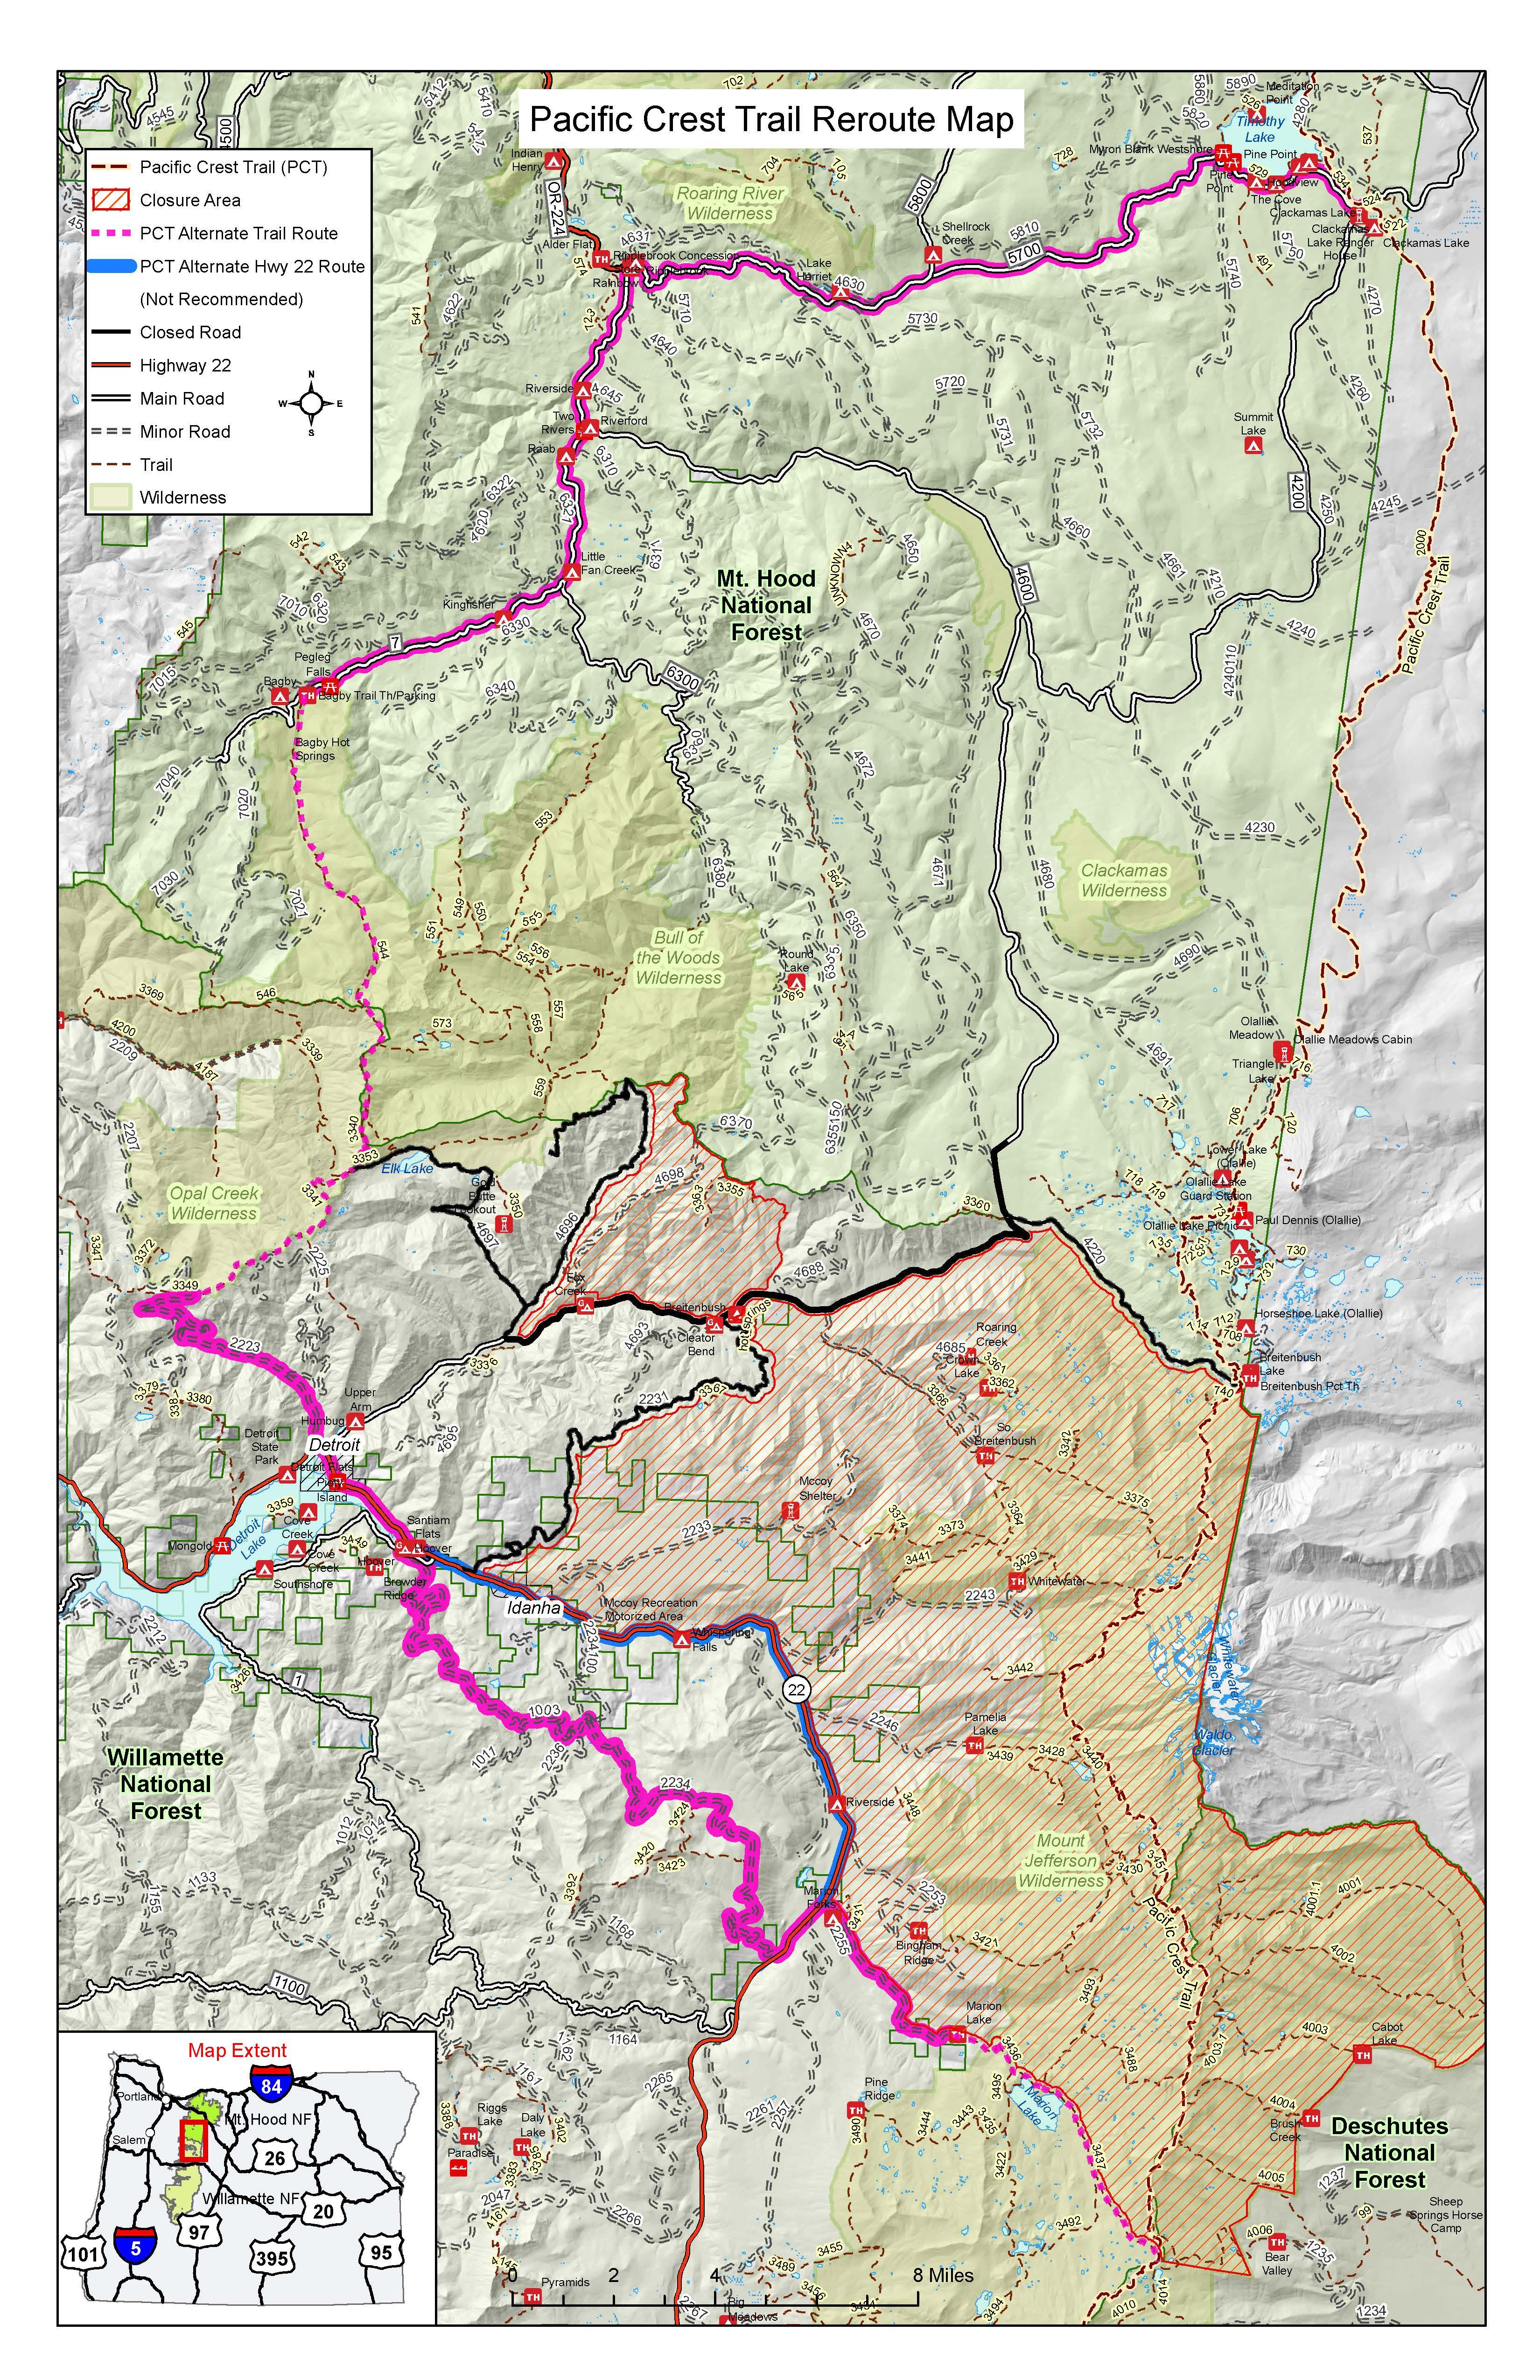 Trail Closure Archives - Pacific Crest Trail Association